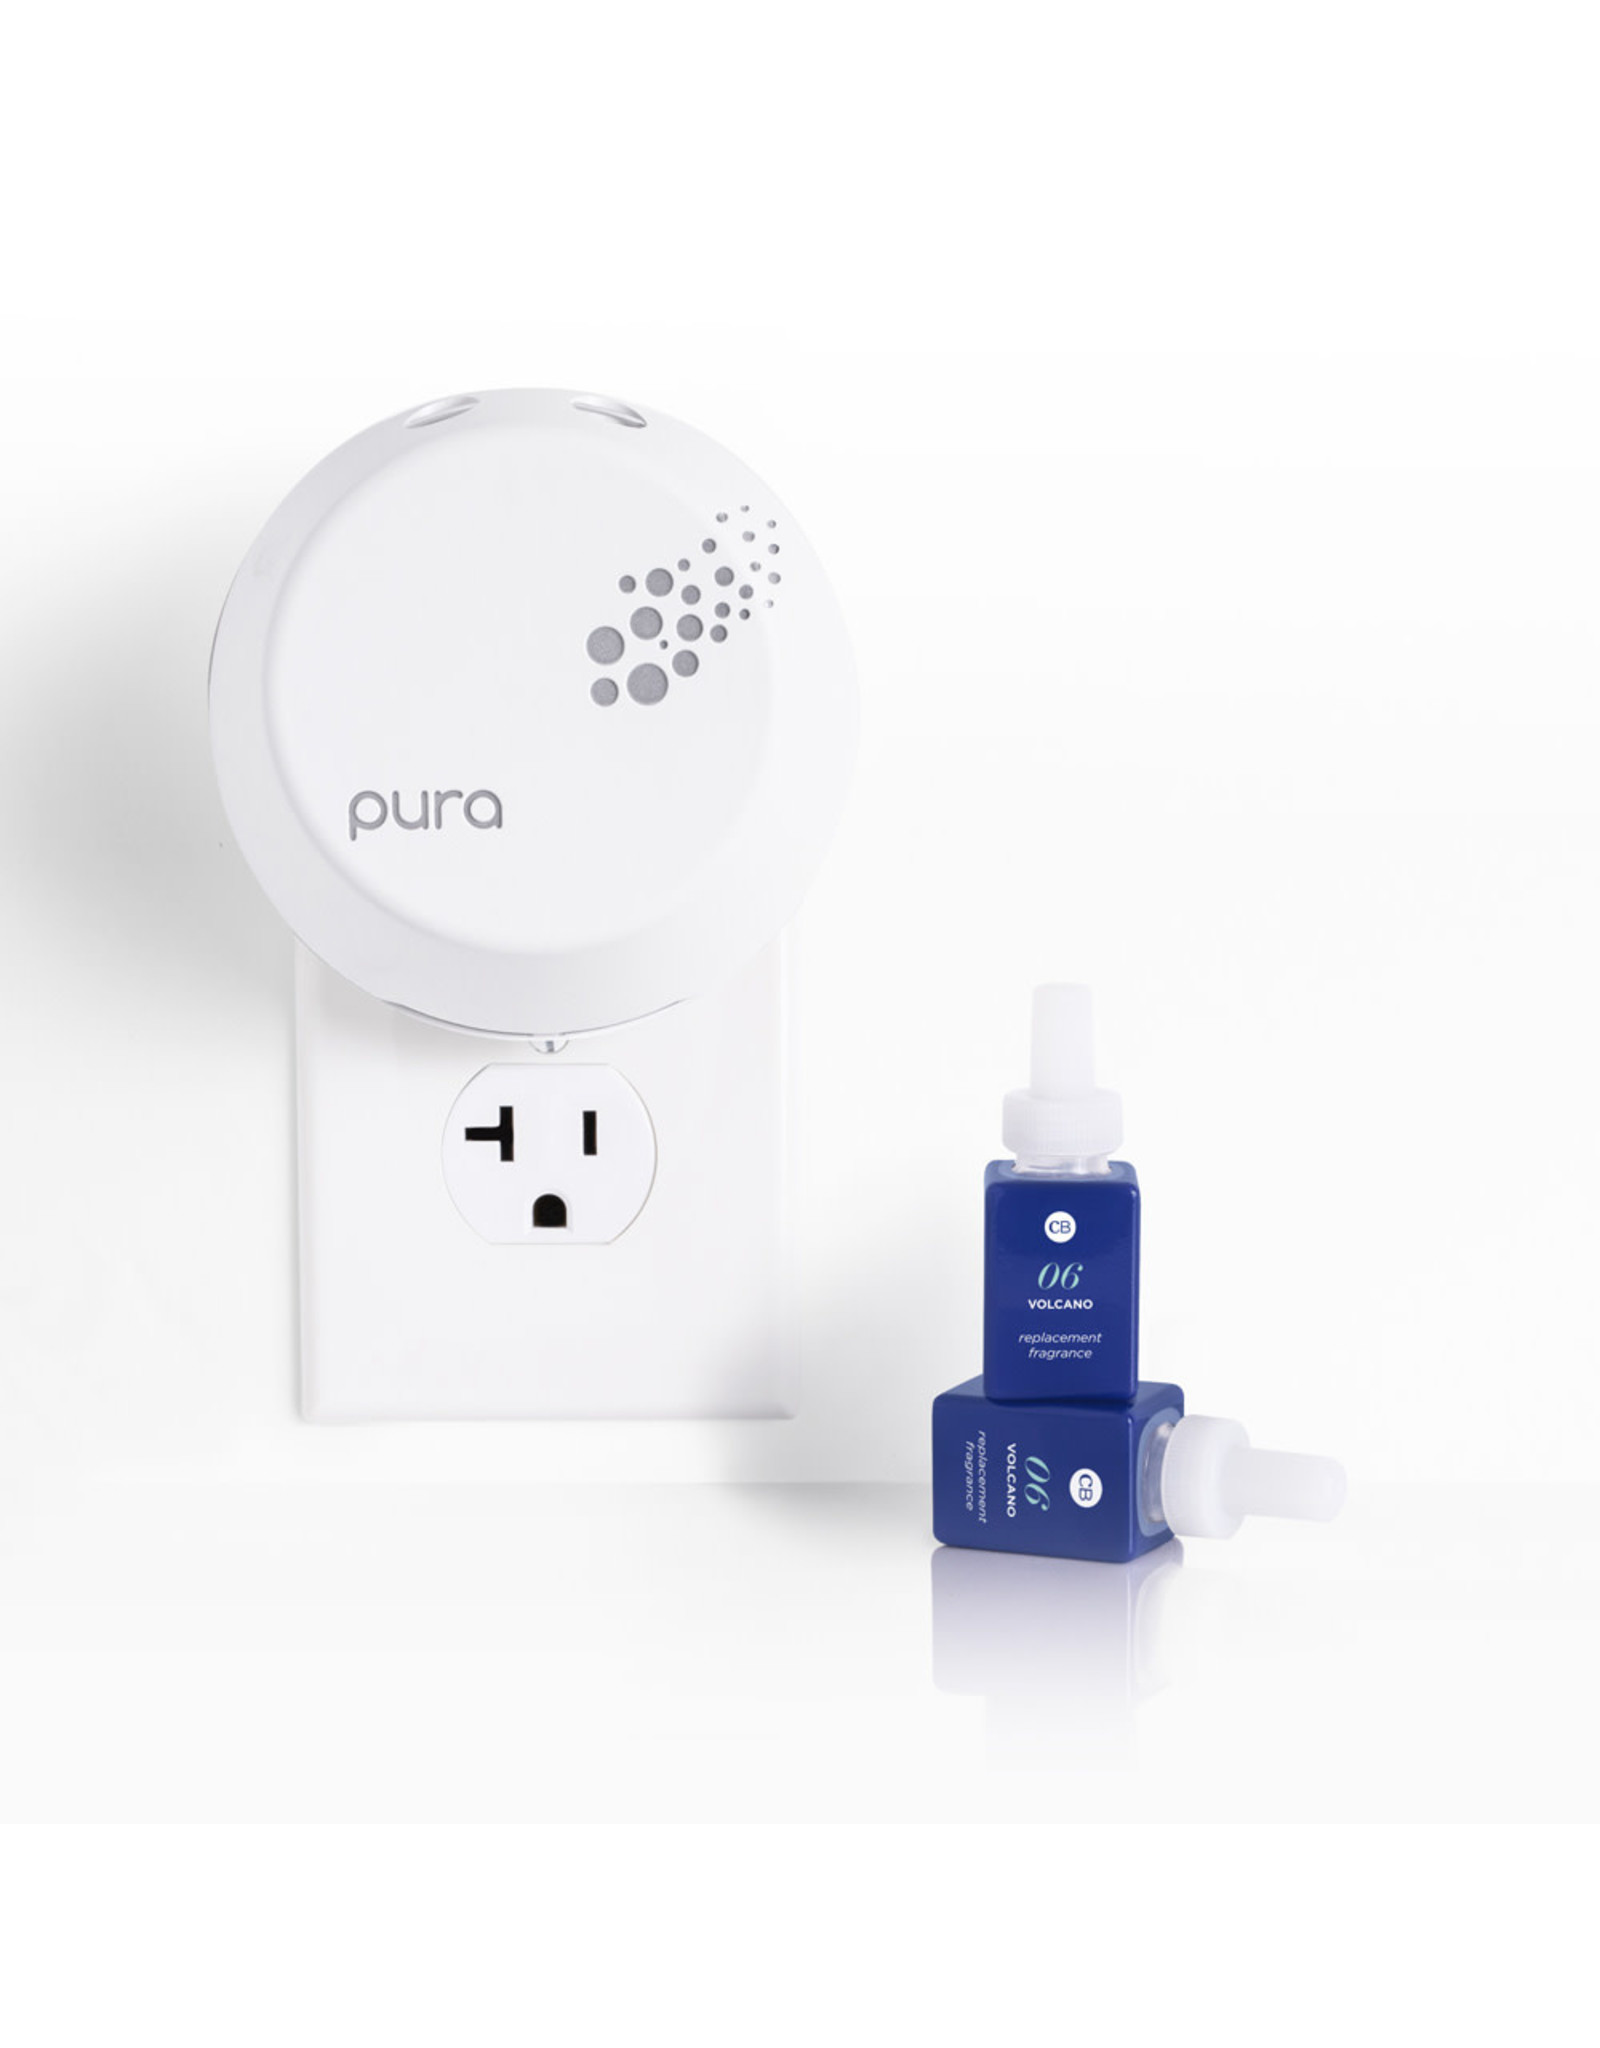 Pura Capri Blue Home Diffuser Kit